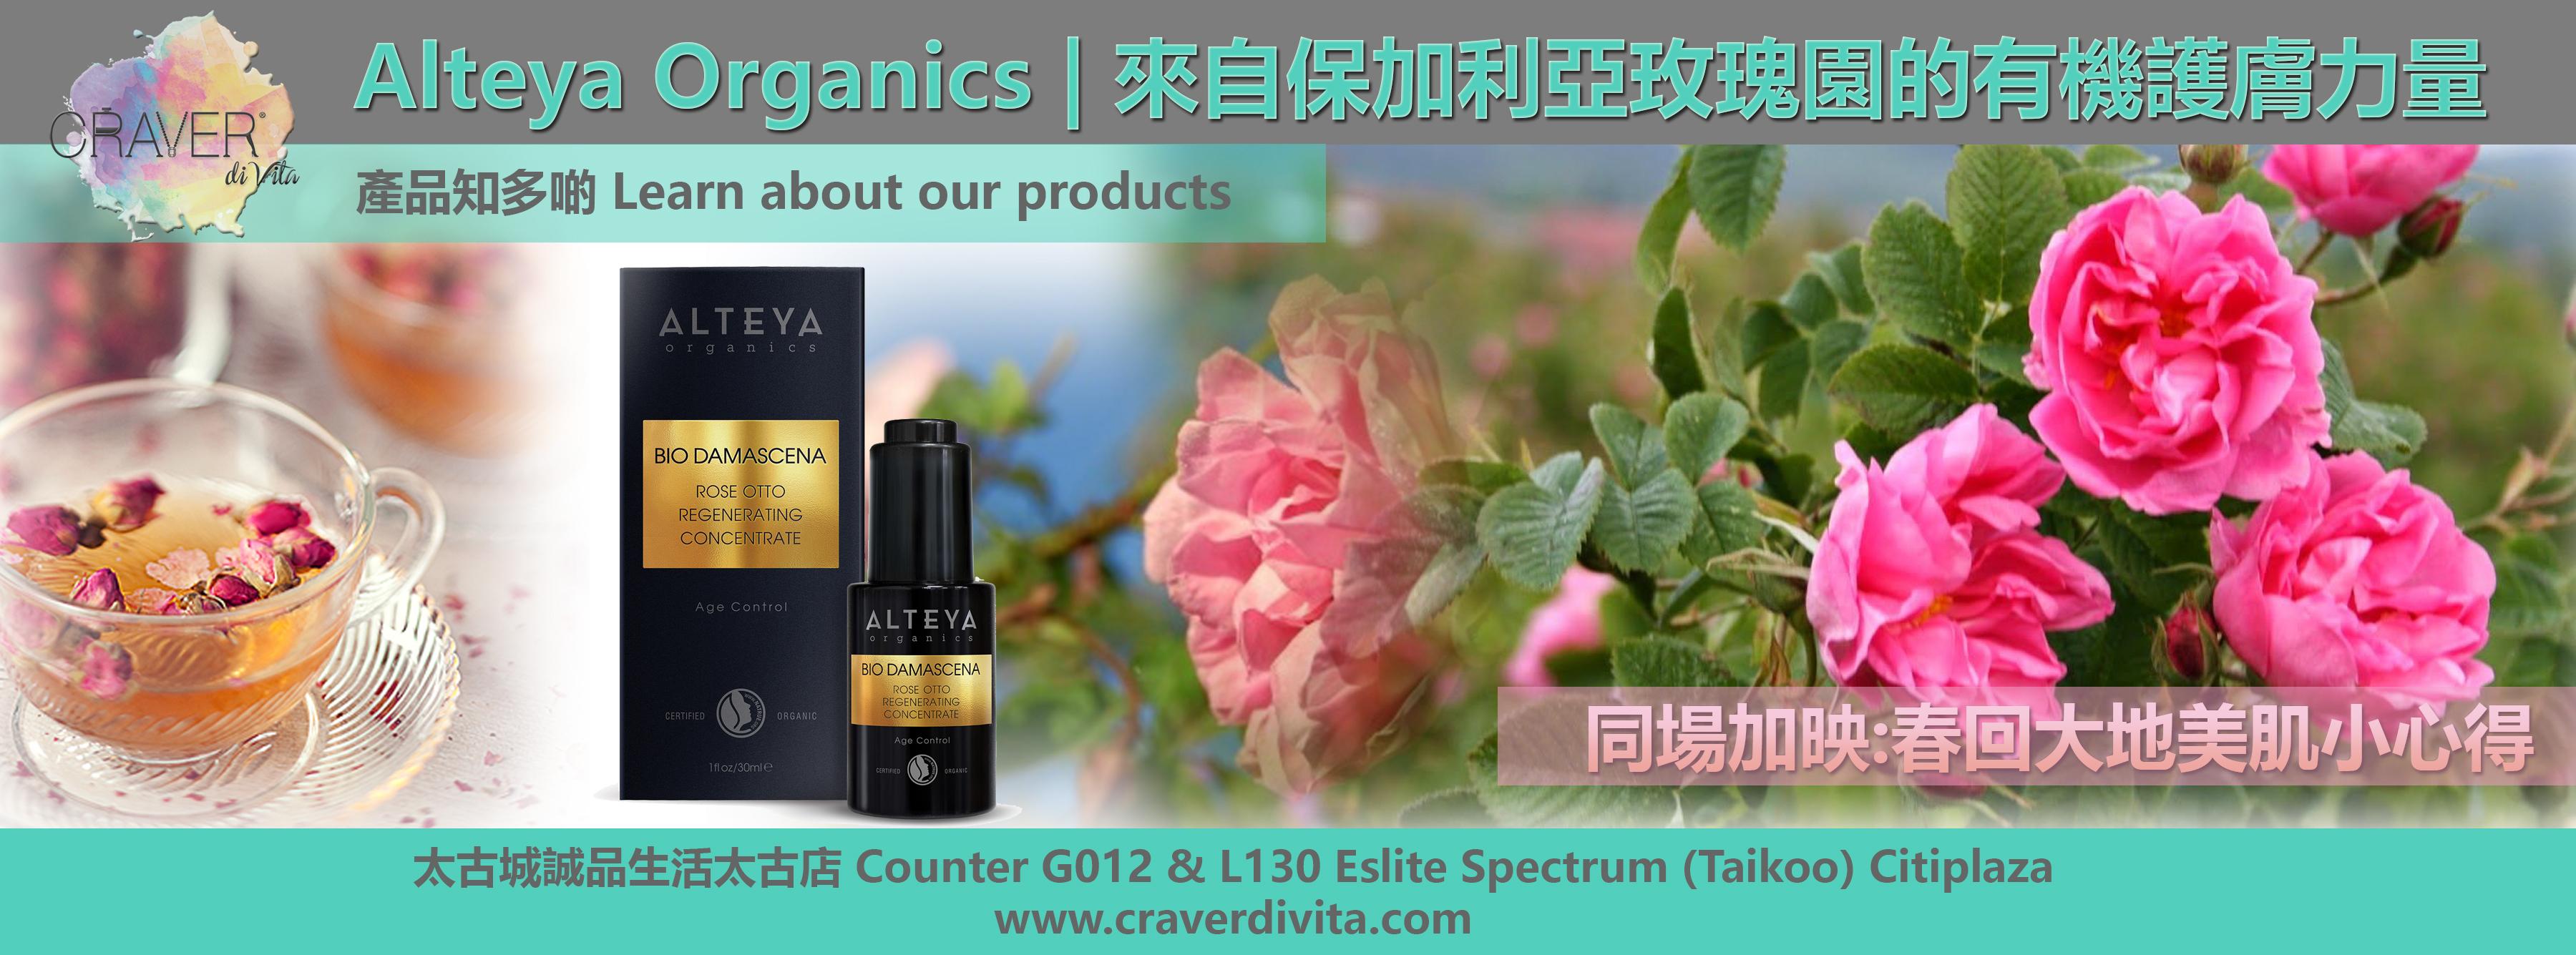 Alteya Organics|來自保加利亞玫瑰園的有機護膚力量